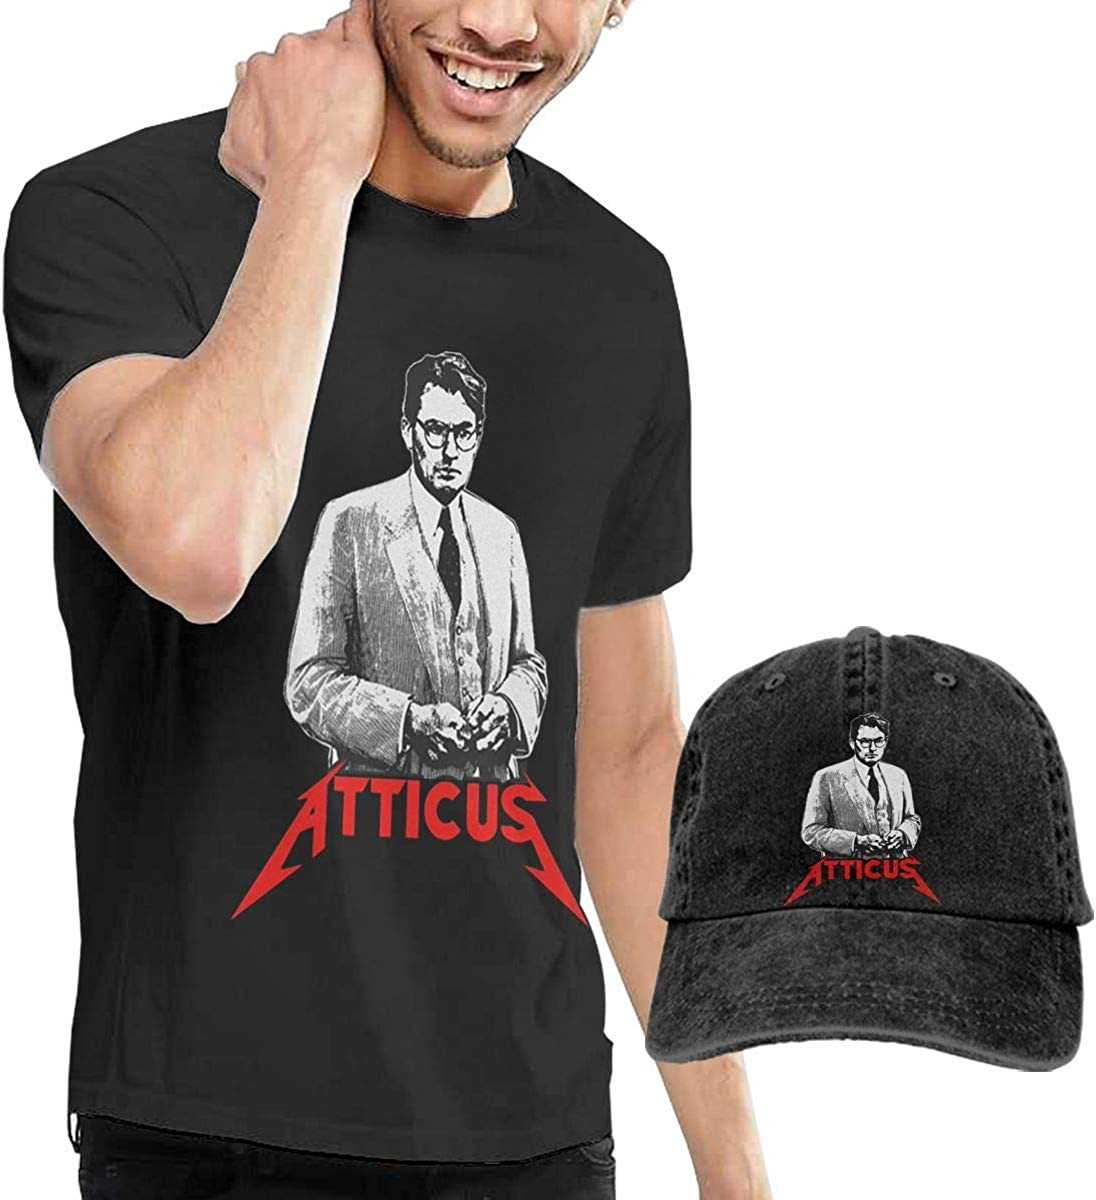 Six23S Atticus para Matar a un ruiseñor Camiseta Negra para ...